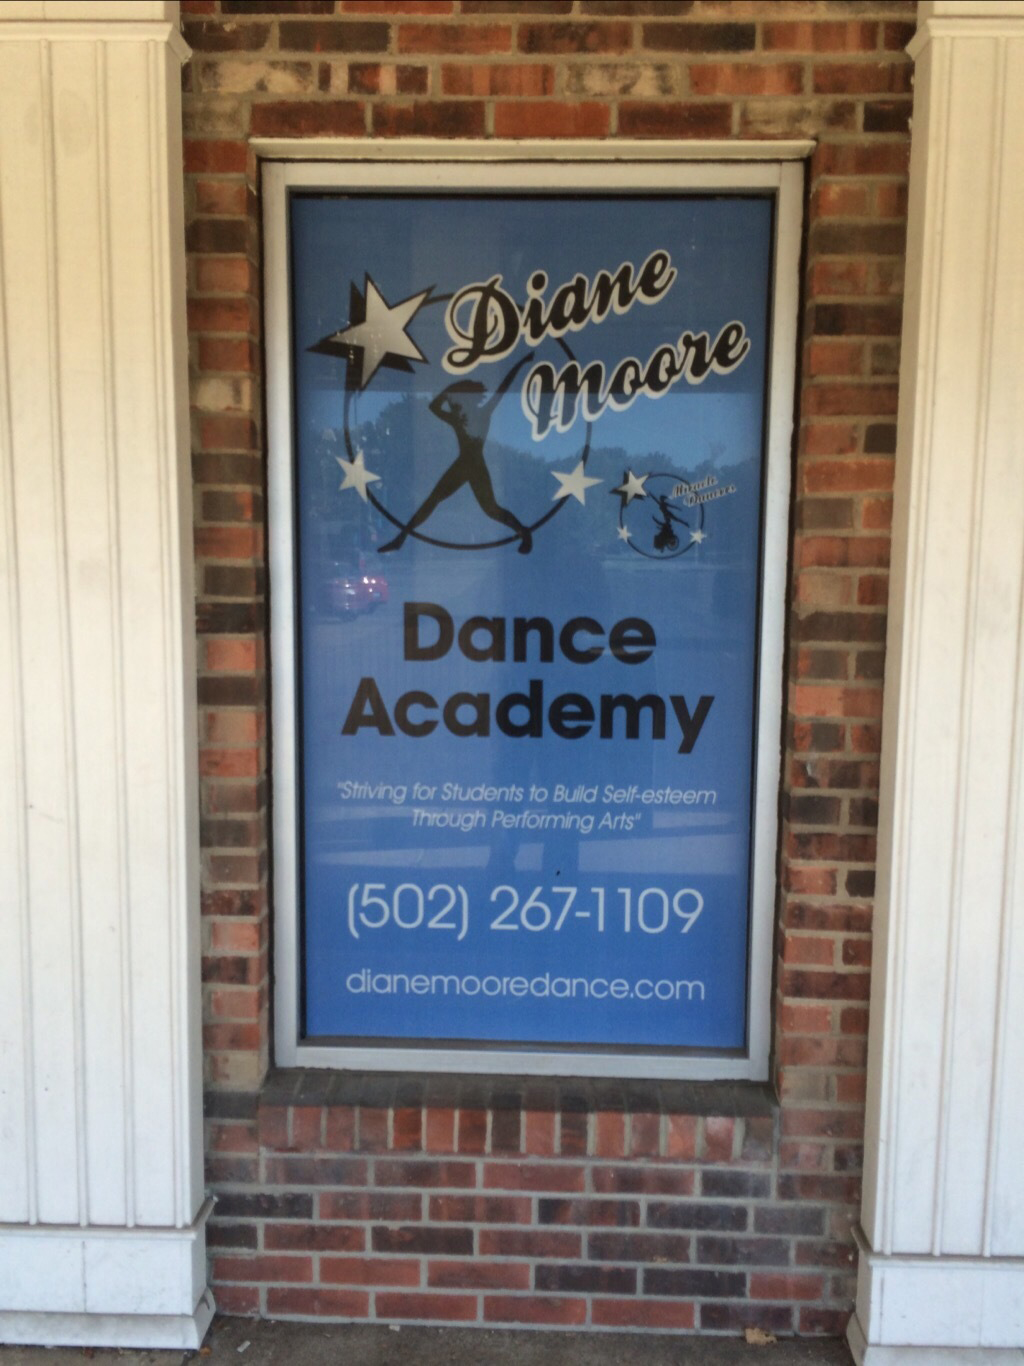 Diane Moore Dance Academy image 5